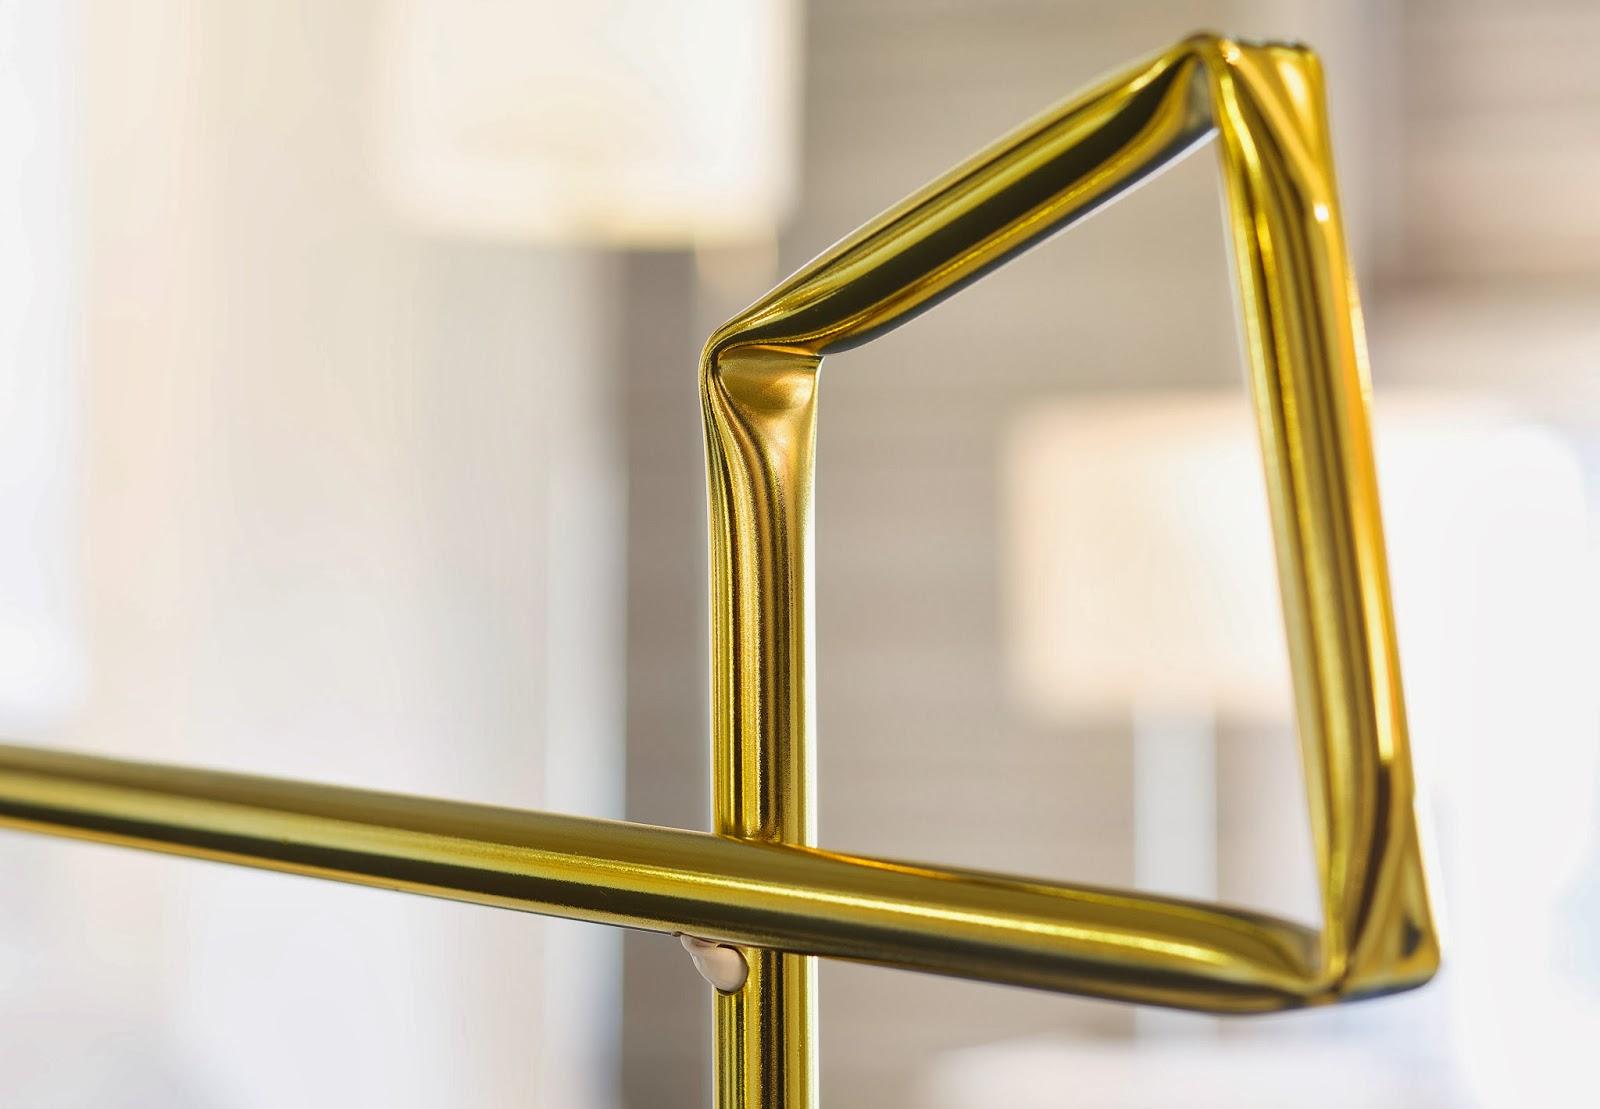 o toulouse design collection luminaire leds mario sce orizona. Black Bedroom Furniture Sets. Home Design Ideas